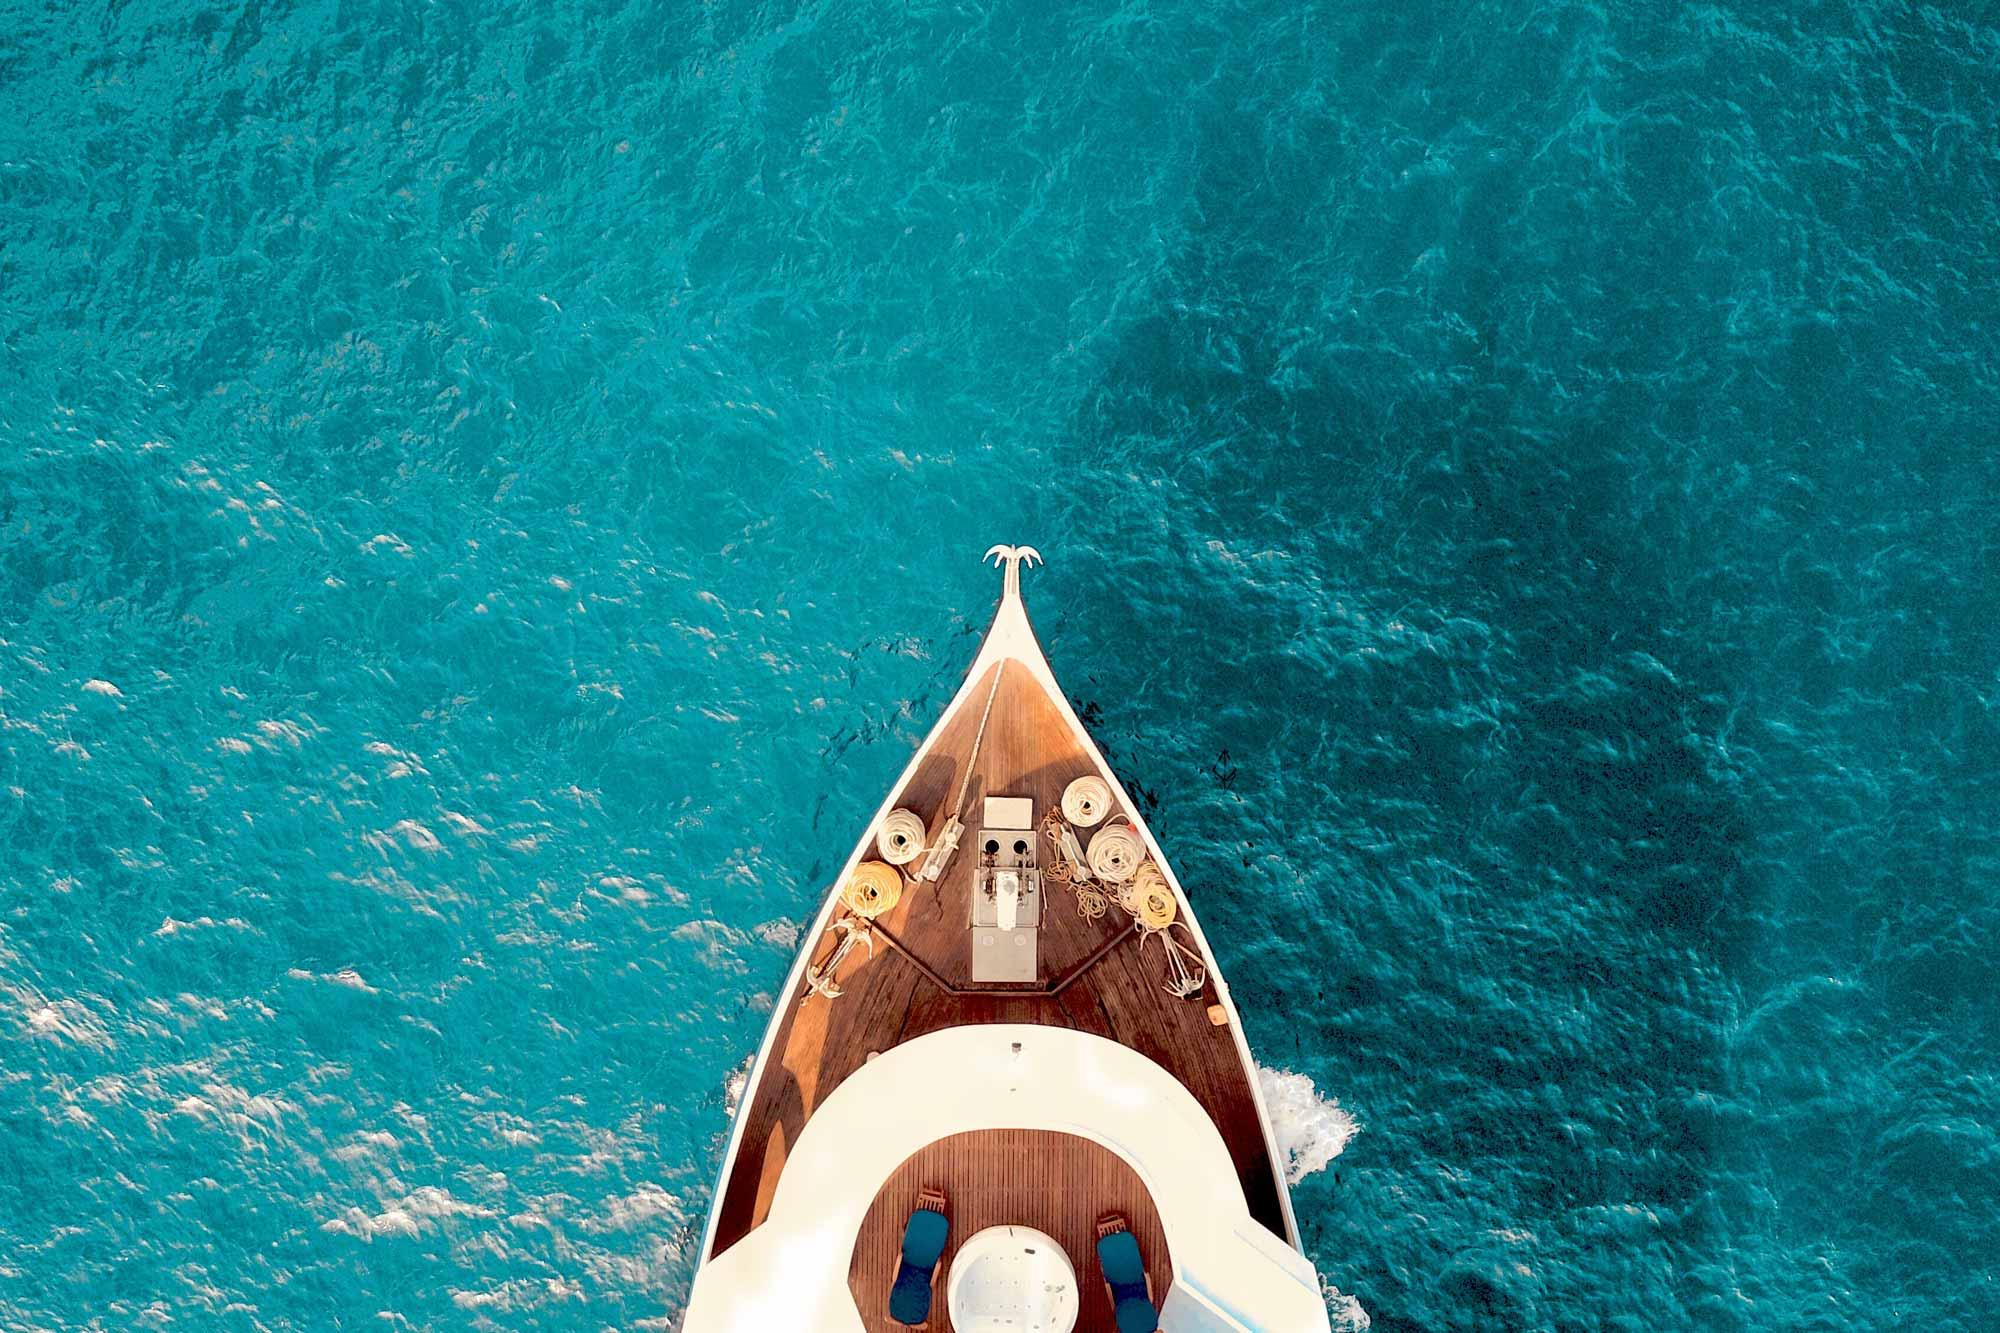 Invisalign Quayside Orthodontics boat